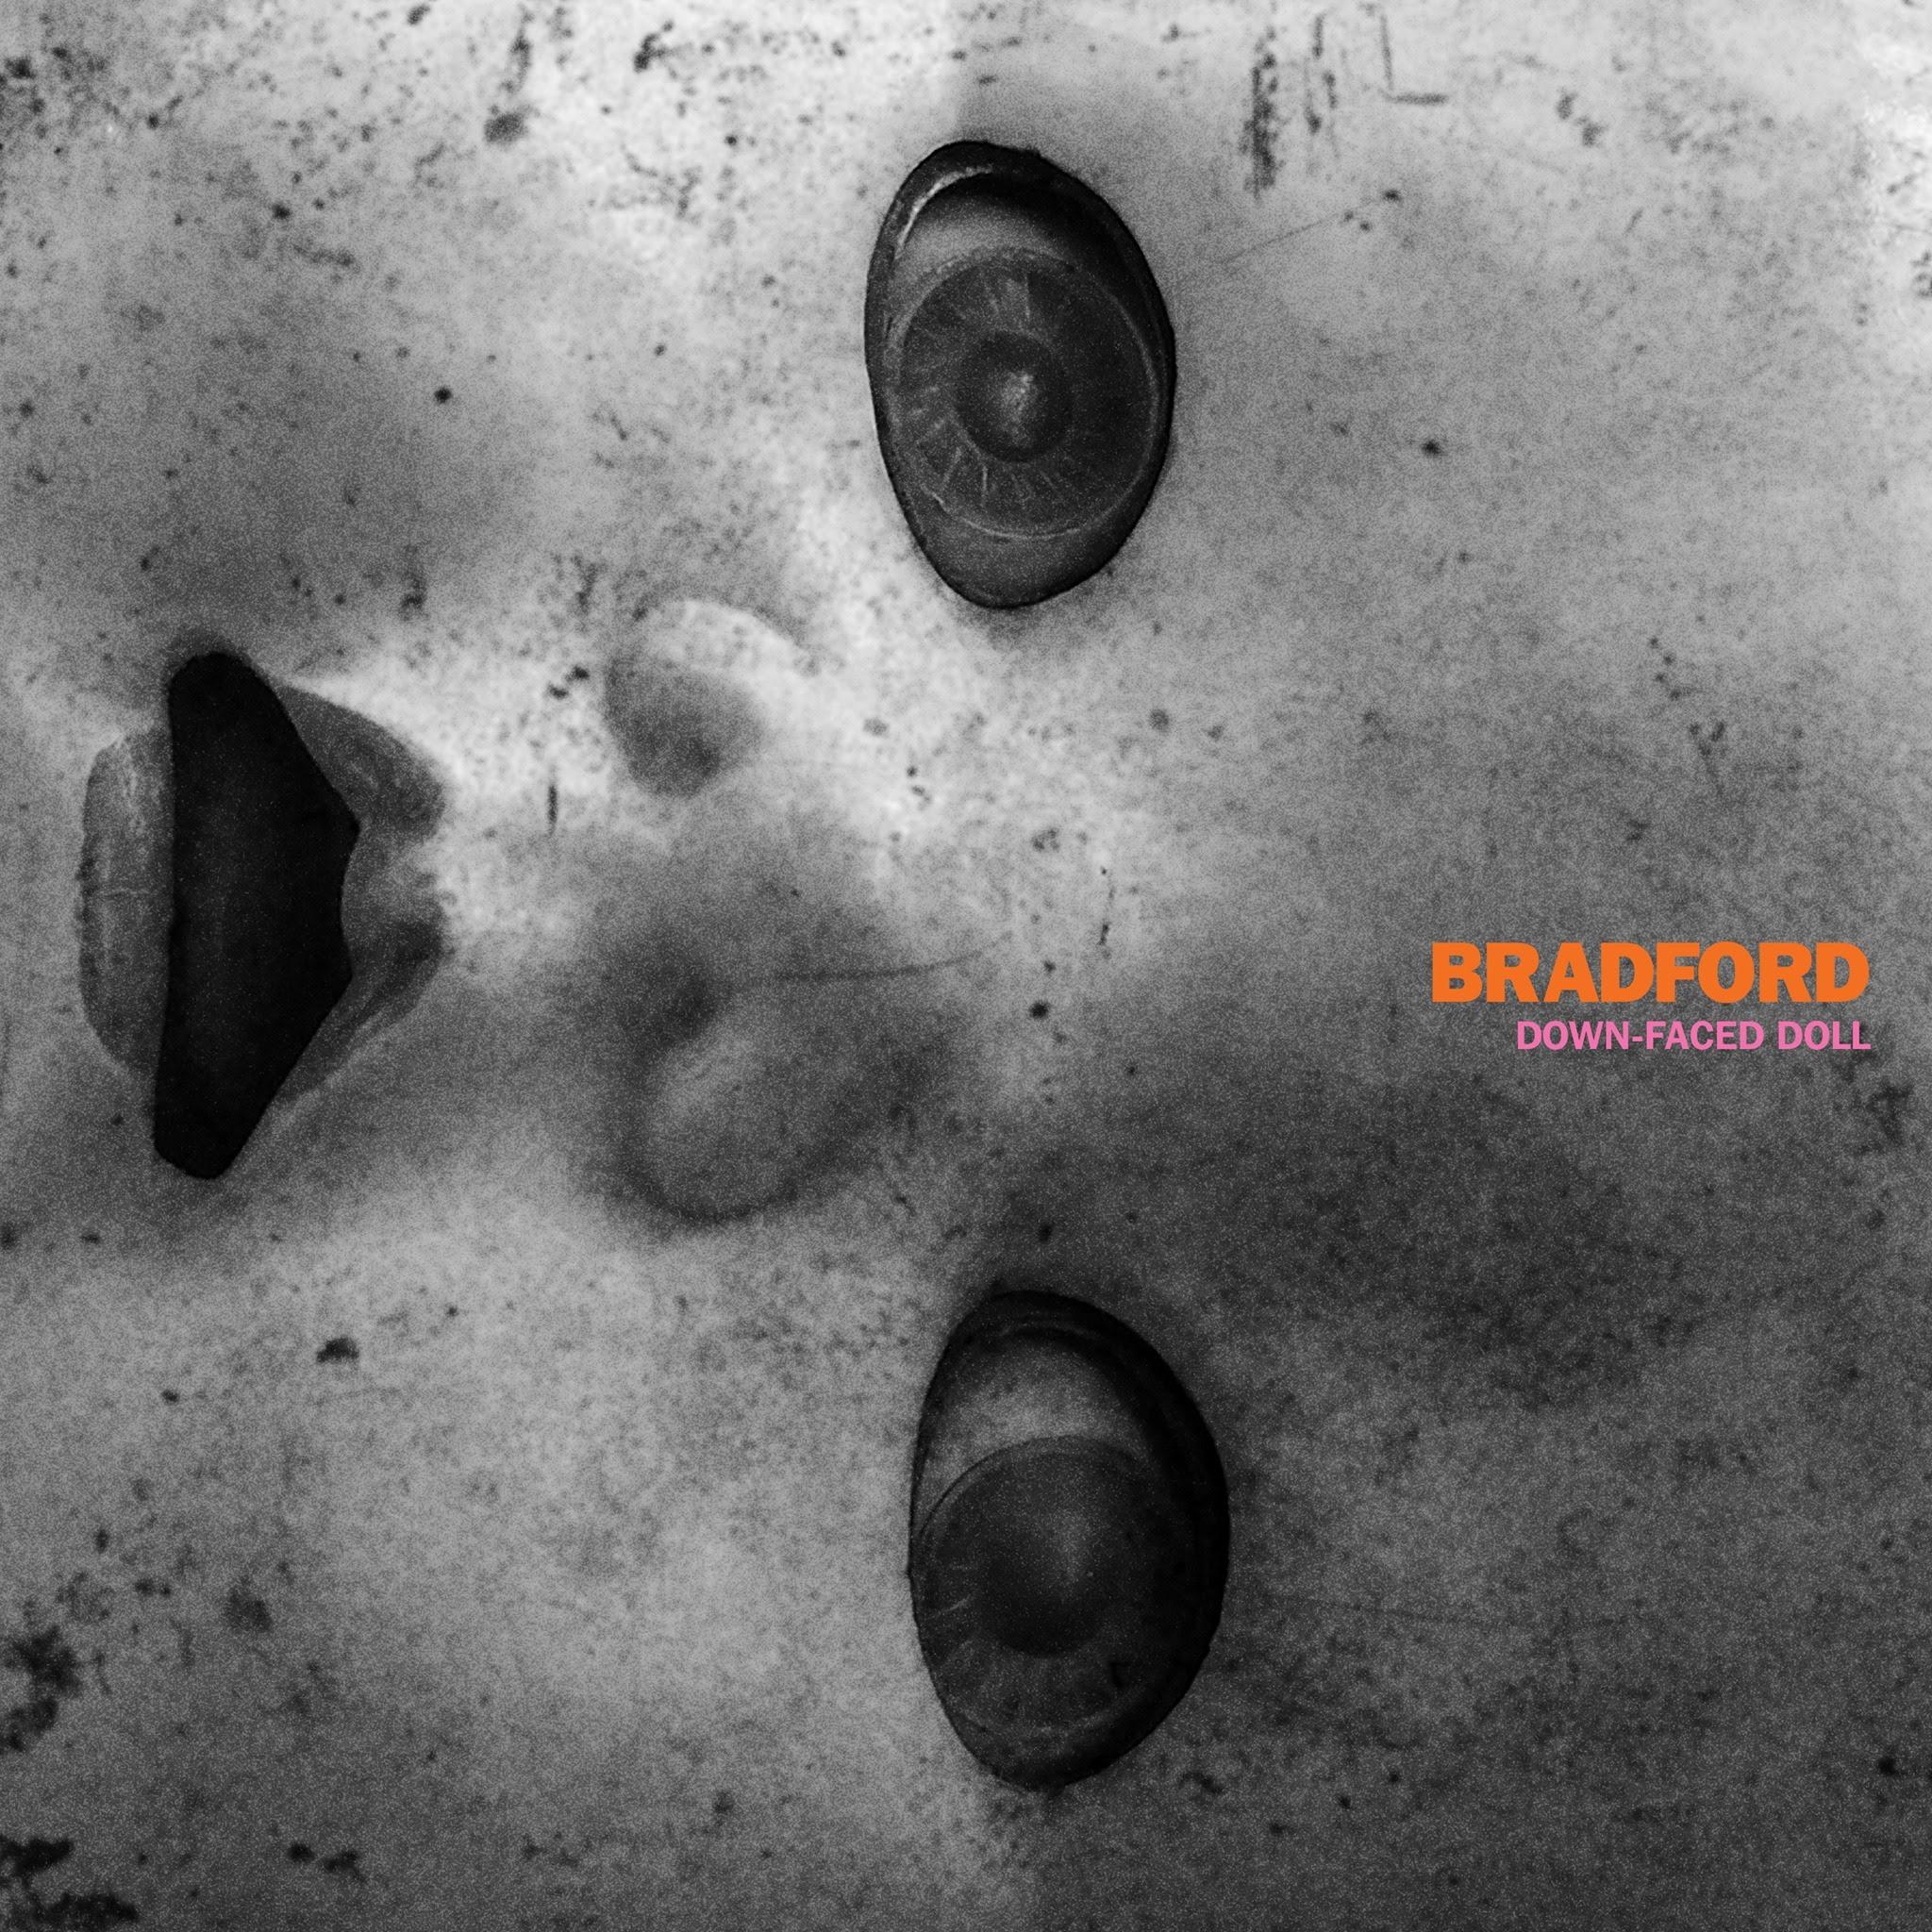 News – Bradford – Down-Faced Doll